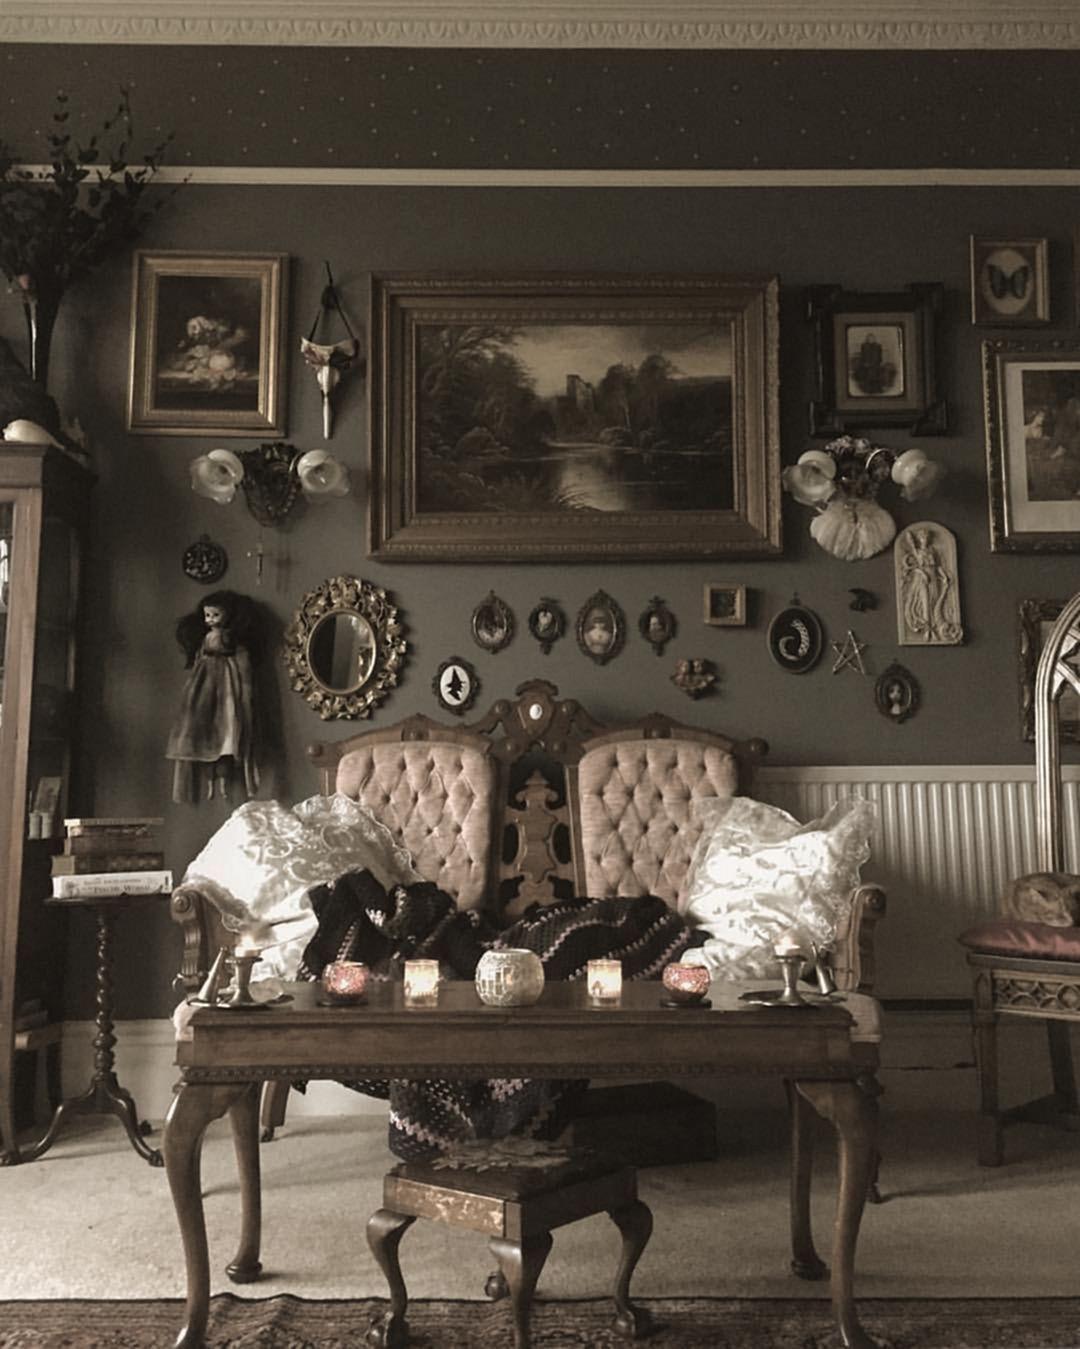 25 Incredible Gothic Living Room Design Decor Ideas For You Inspiration Goth Home Decor Gothic Home Decor Gothic Living Room